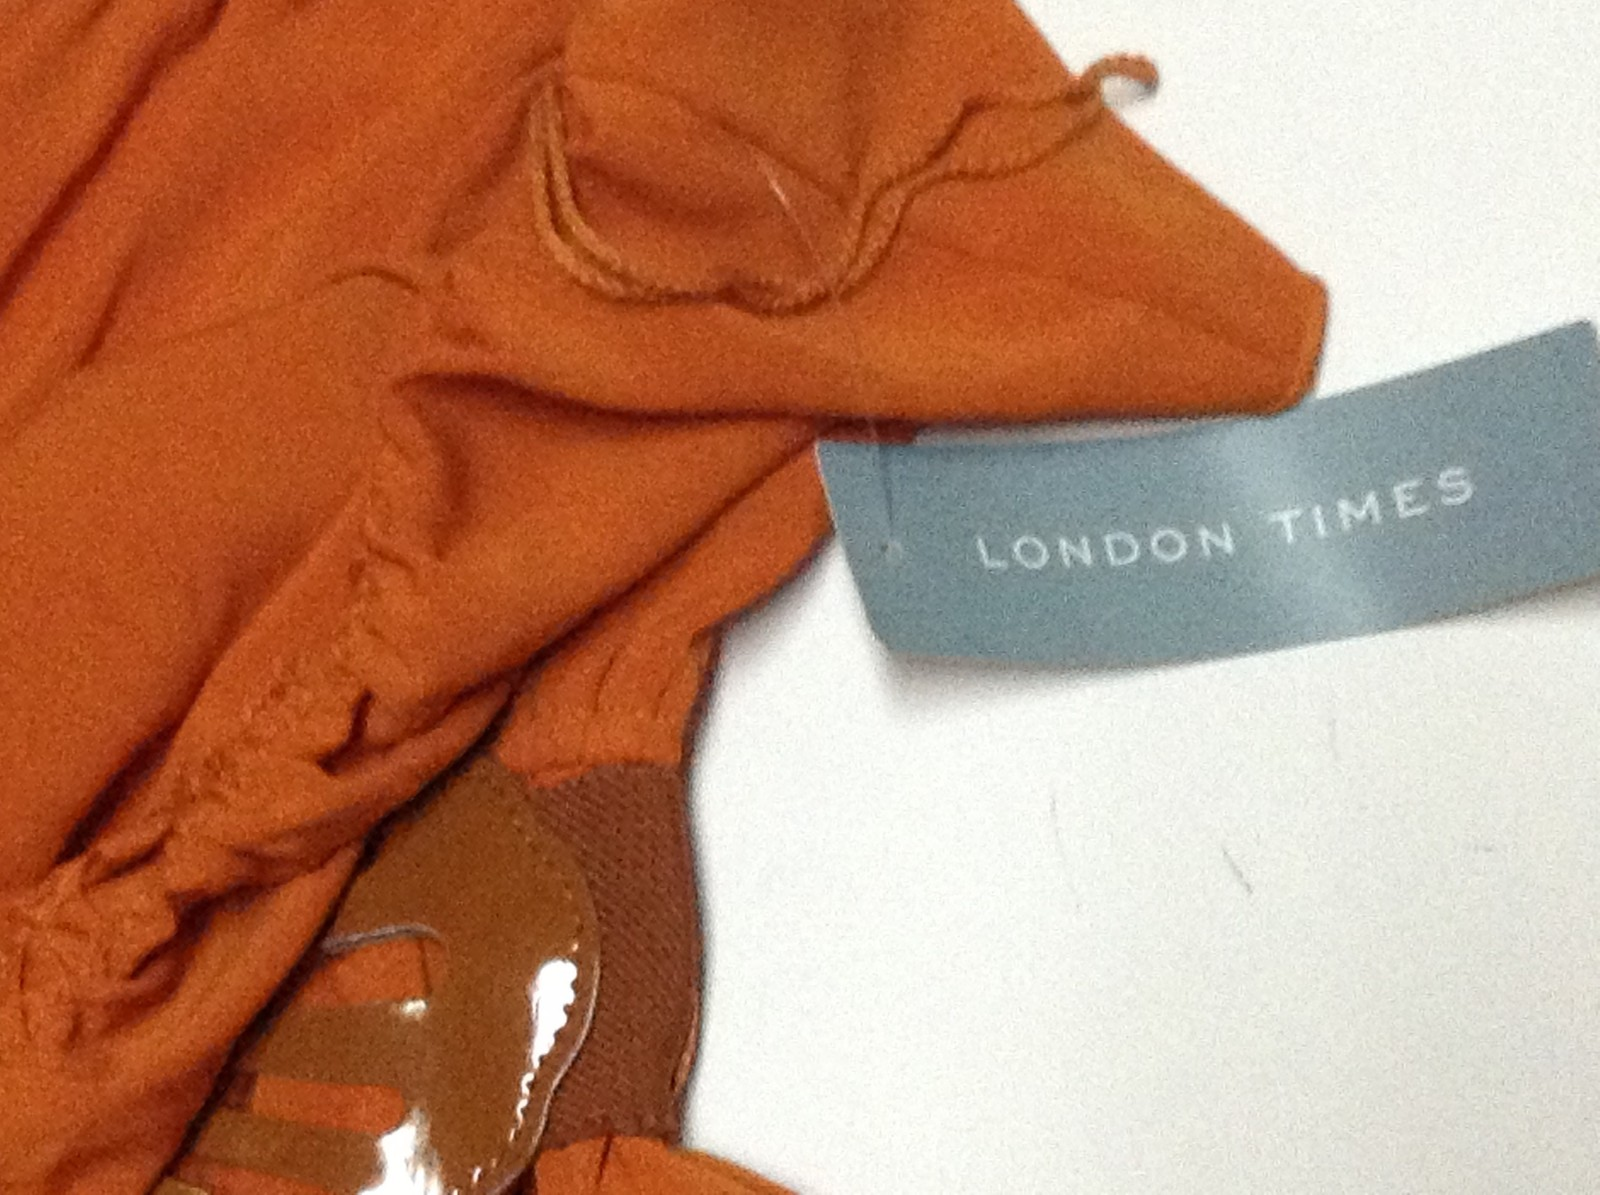 London Times Halter Dress NWT Size 10 Orange